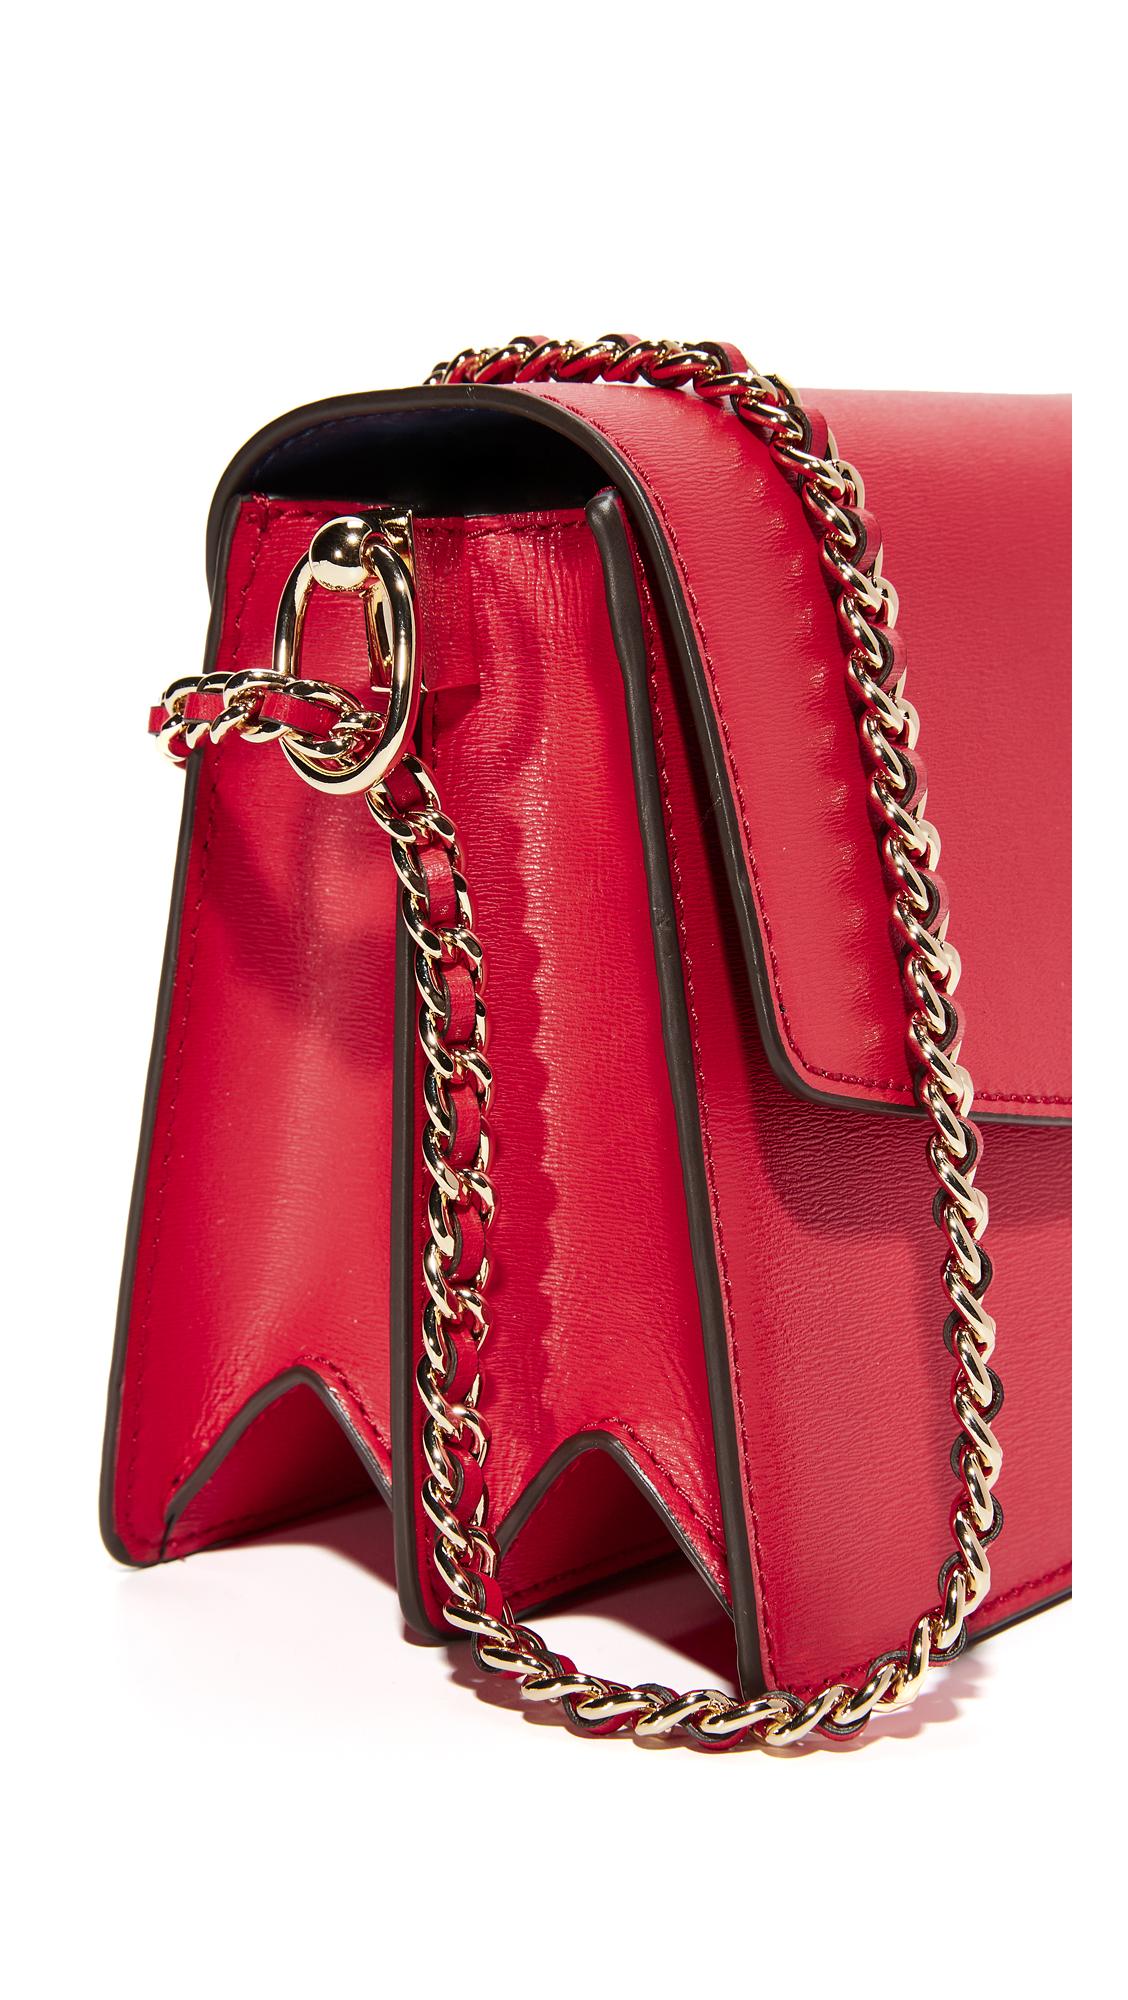 7168955711be Tory Burch Parker Convertible Shoulder Bag